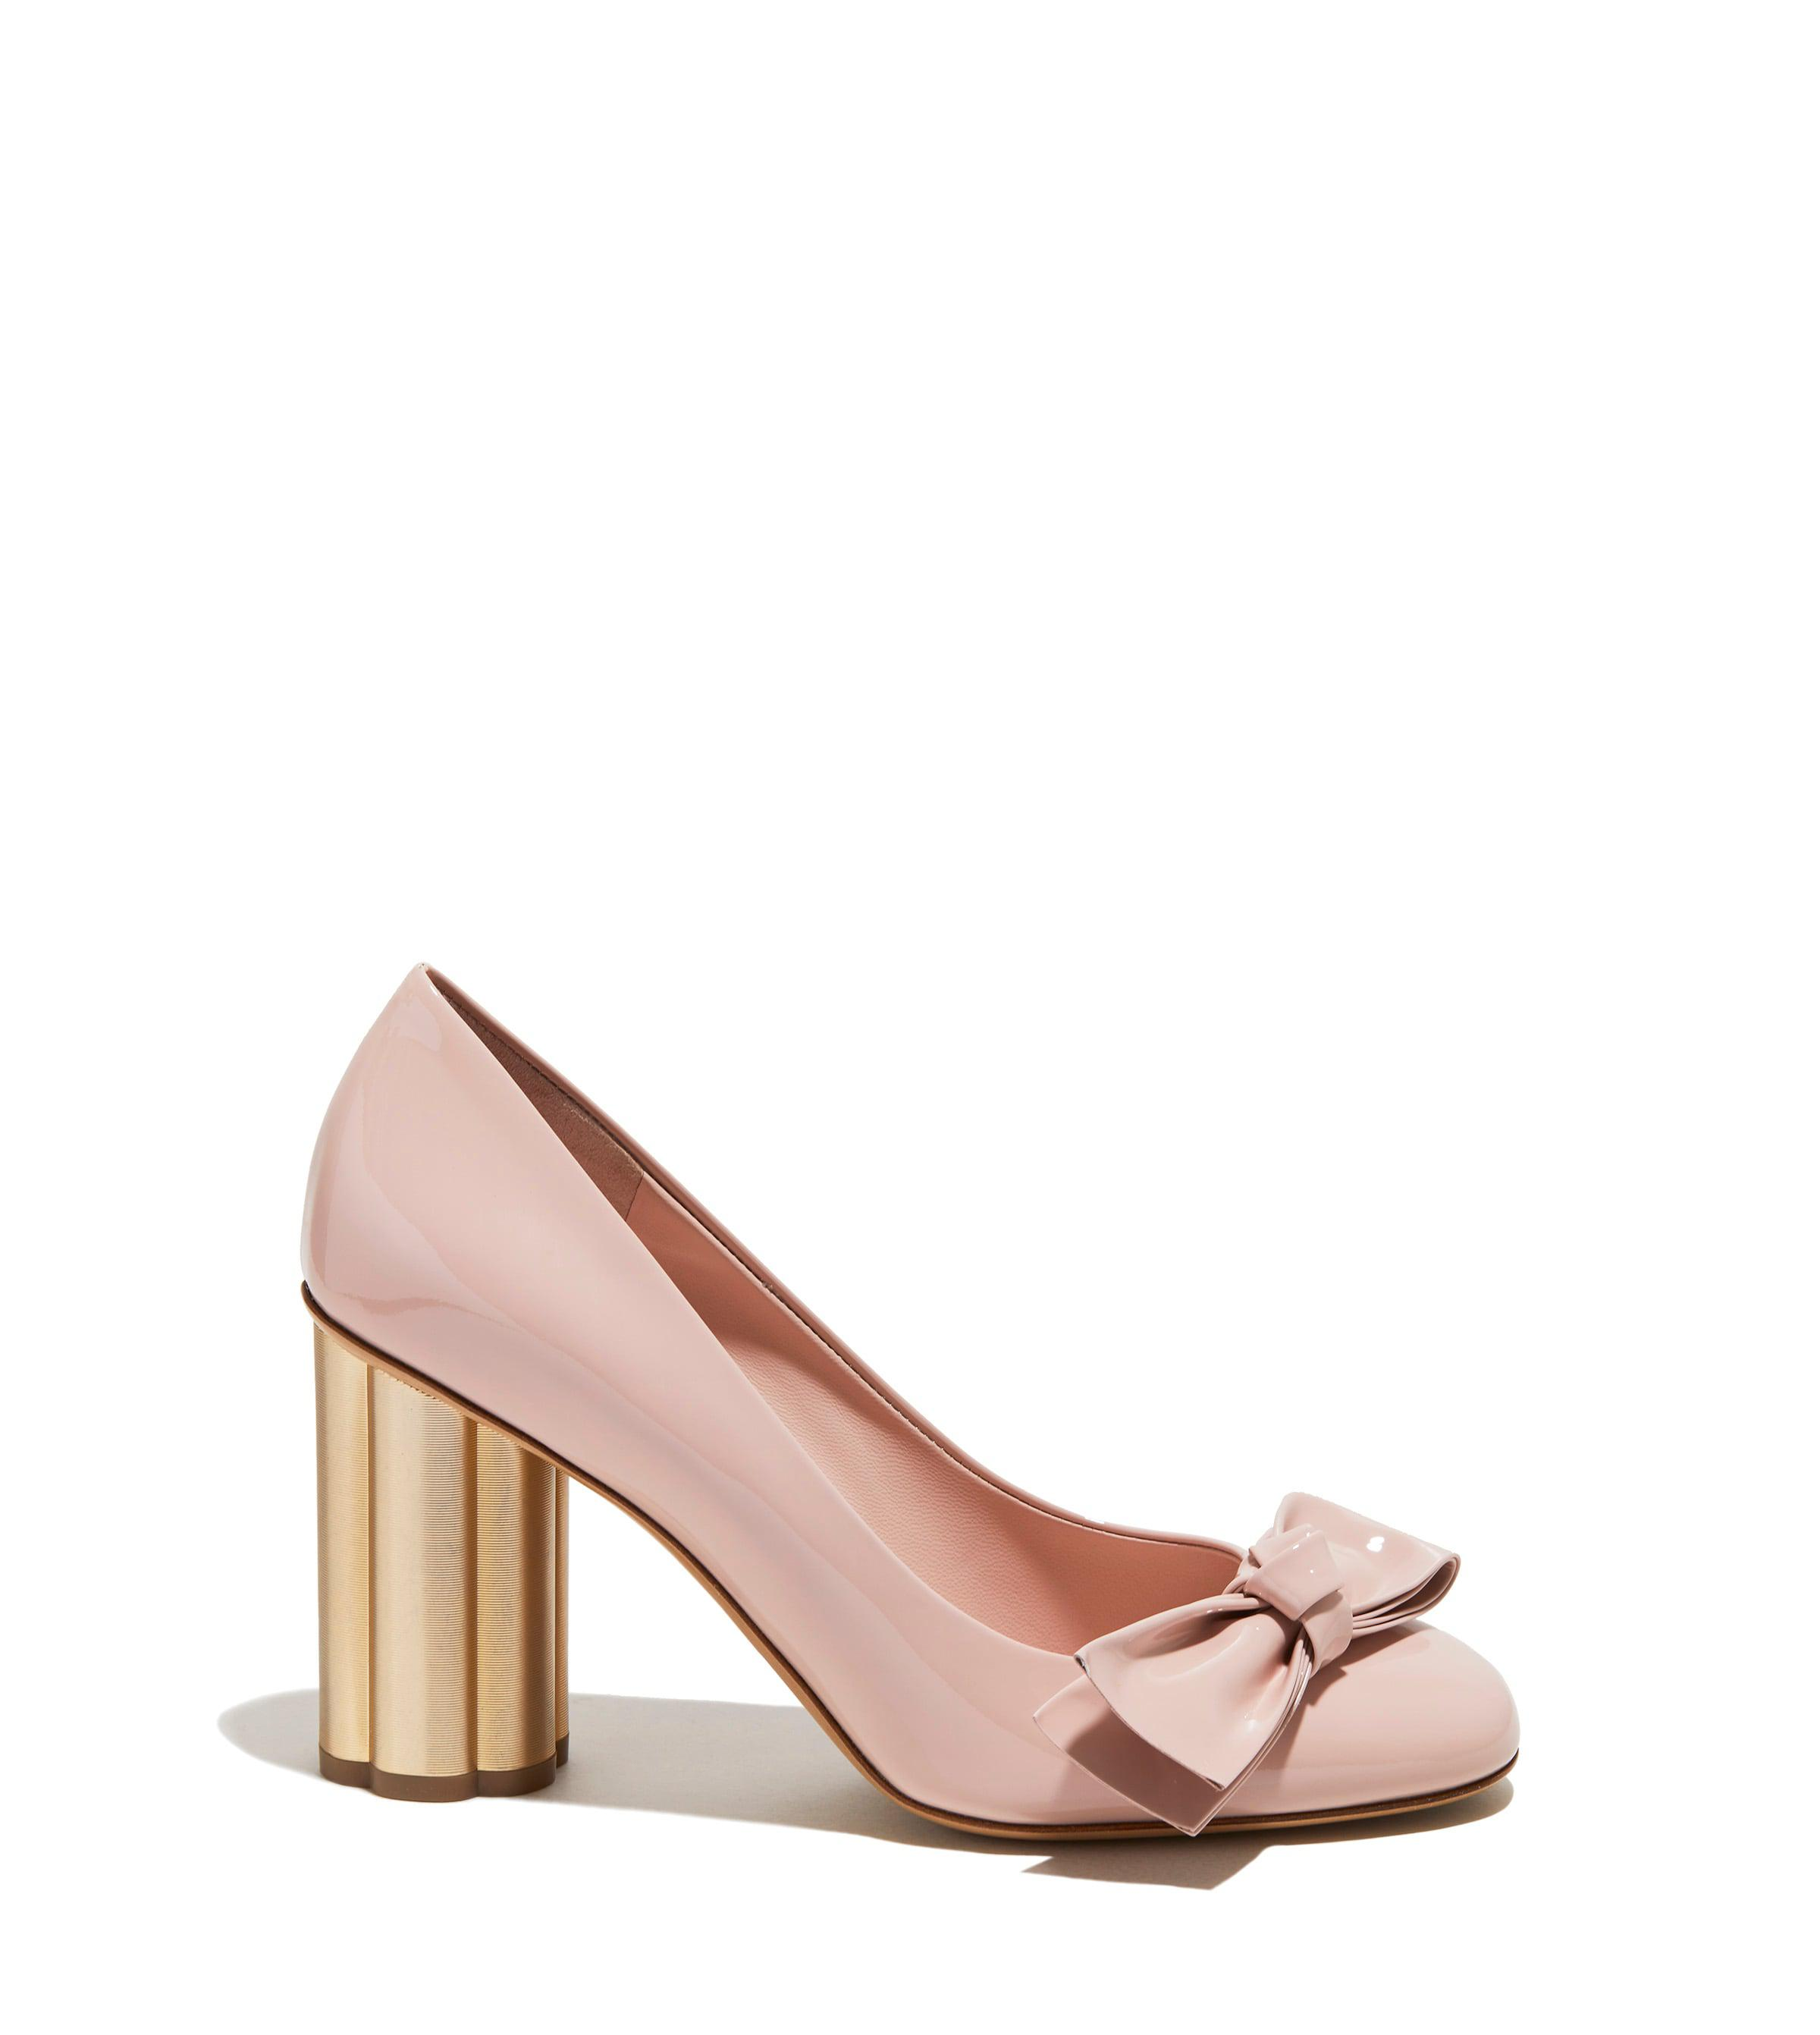 ad25bbc275d Lyst - Ferragamo Flower Heel Pump Shoe in Pink